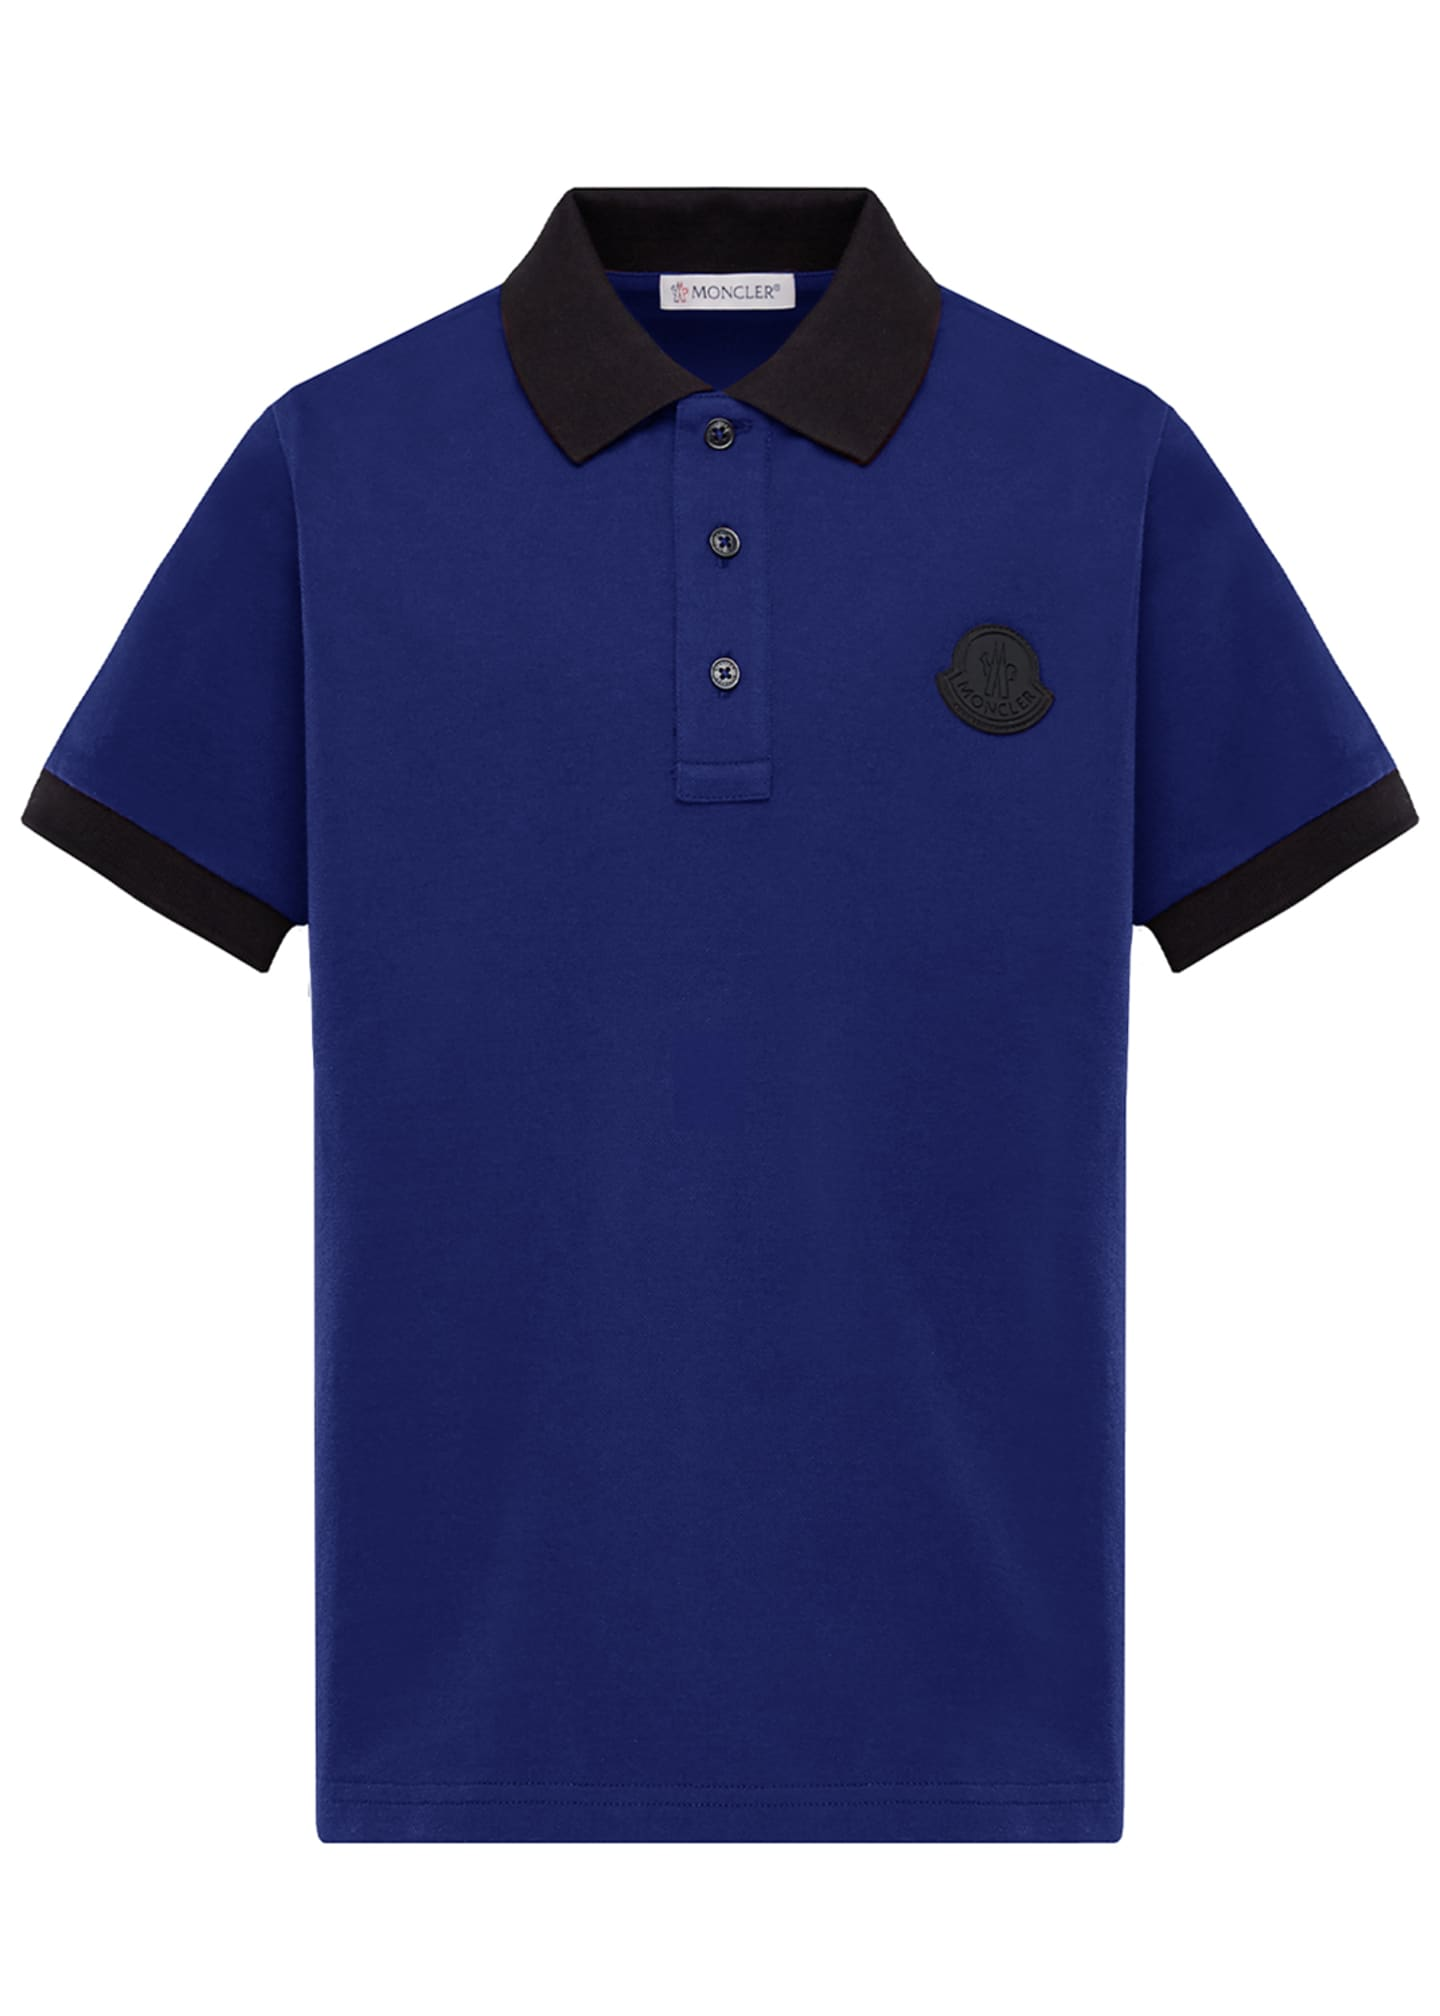 Moncler Contrast-Trim Polo Shirt, Size 4-6